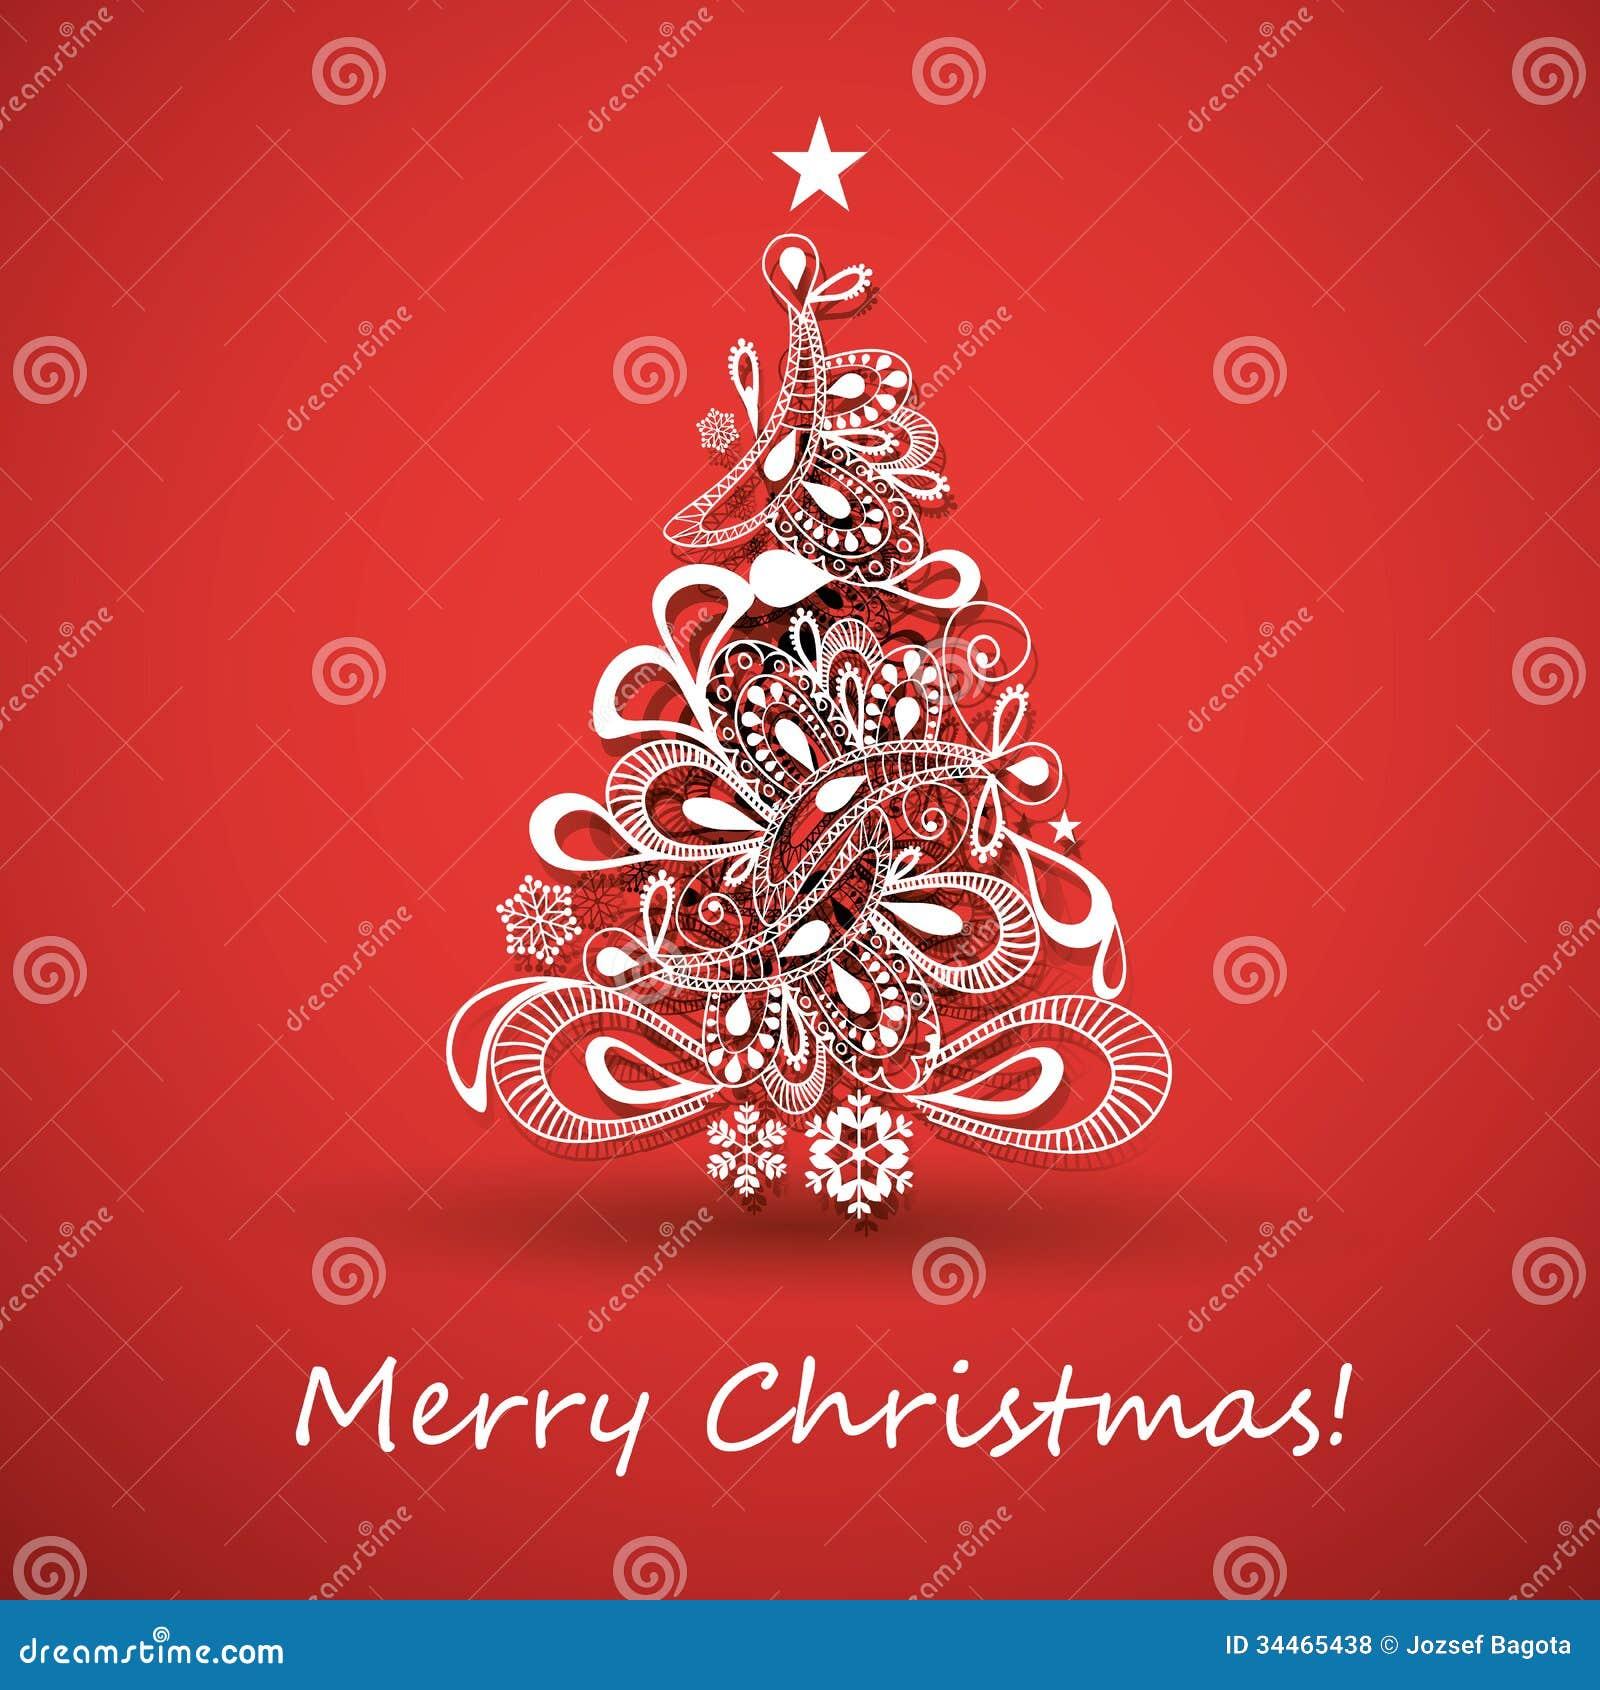 christmas greeting card royalty stock photos image 34465438 christmas greeting card